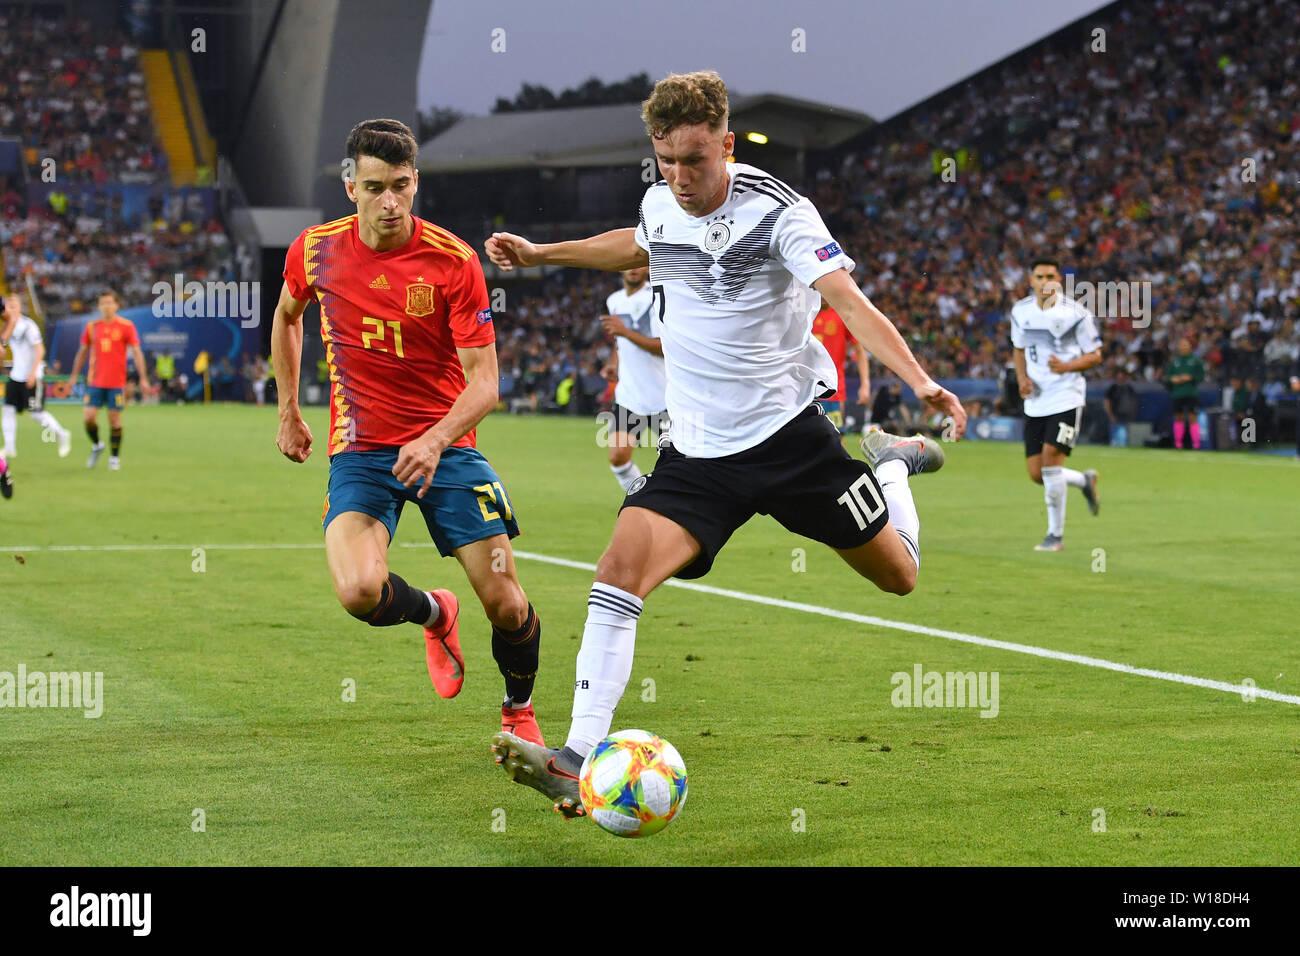 Luca WALDSCHMIDT (GER), Action, duels versus Marc ROCA (ESP). Spain (ESP) - Germany (GER) 2-1, at 30.06.2019 Stadio Friuli Udine. Football U-21, FINALE UEFA Under21 European Championship in Italy/SanMarino from 16.-30.06.2019. | Usage worldwide - Stock Image